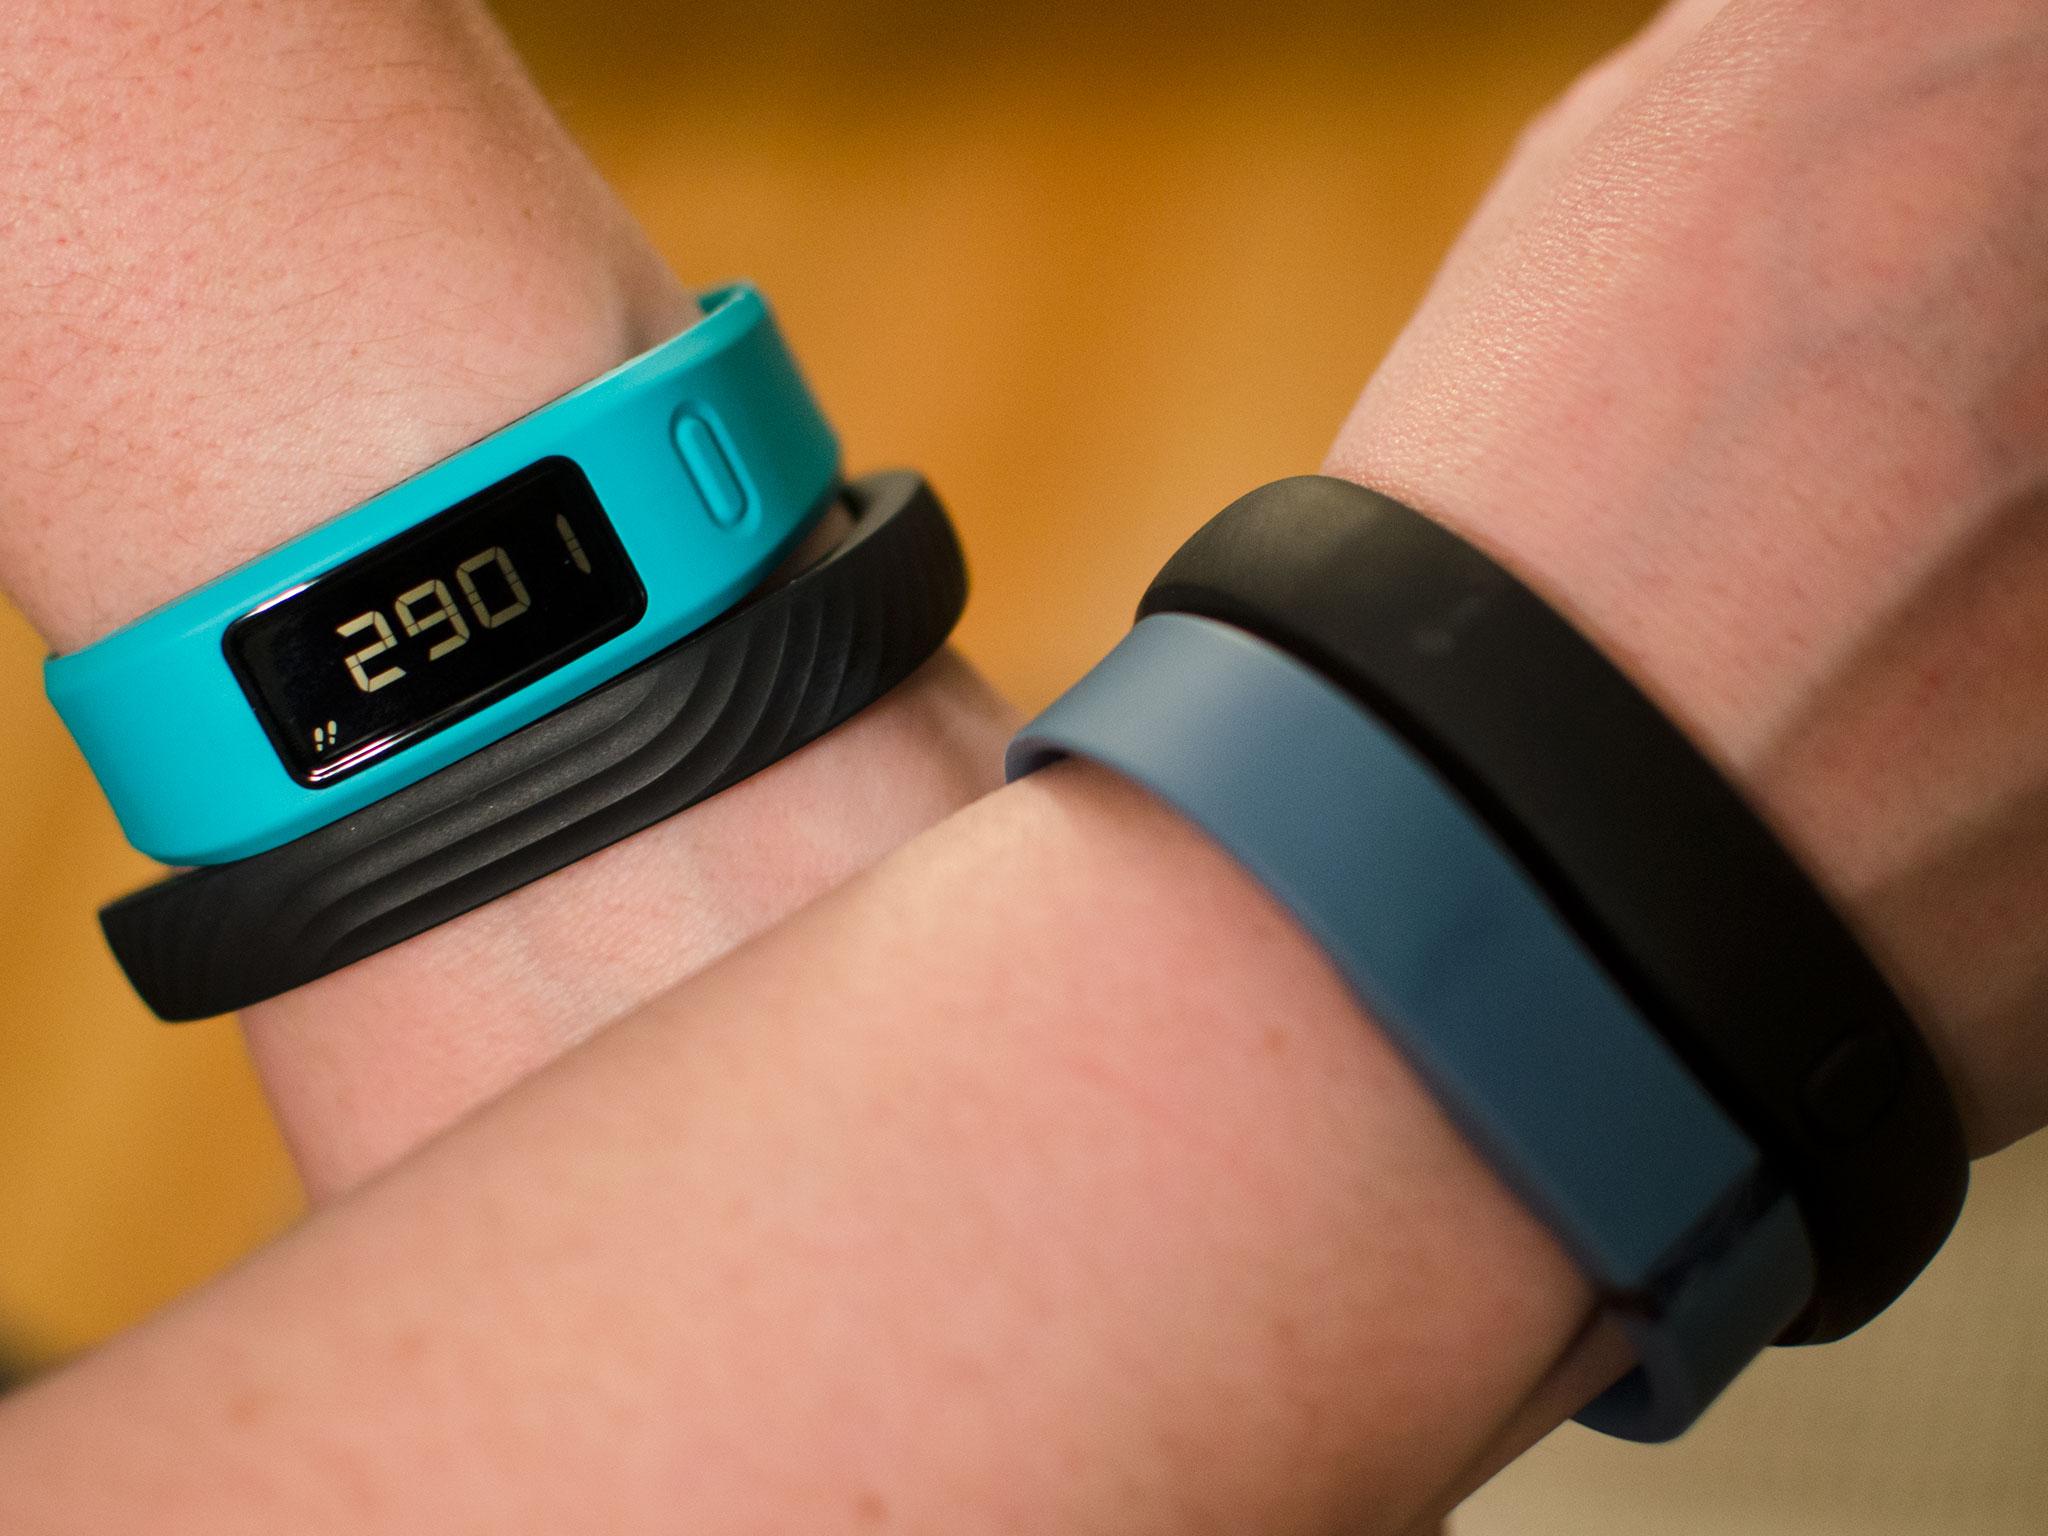 Best fitness tracker: Fitbit Flex vs Jawbone UP24 vs Nike FuelBand SE vs Garmin vivofit!